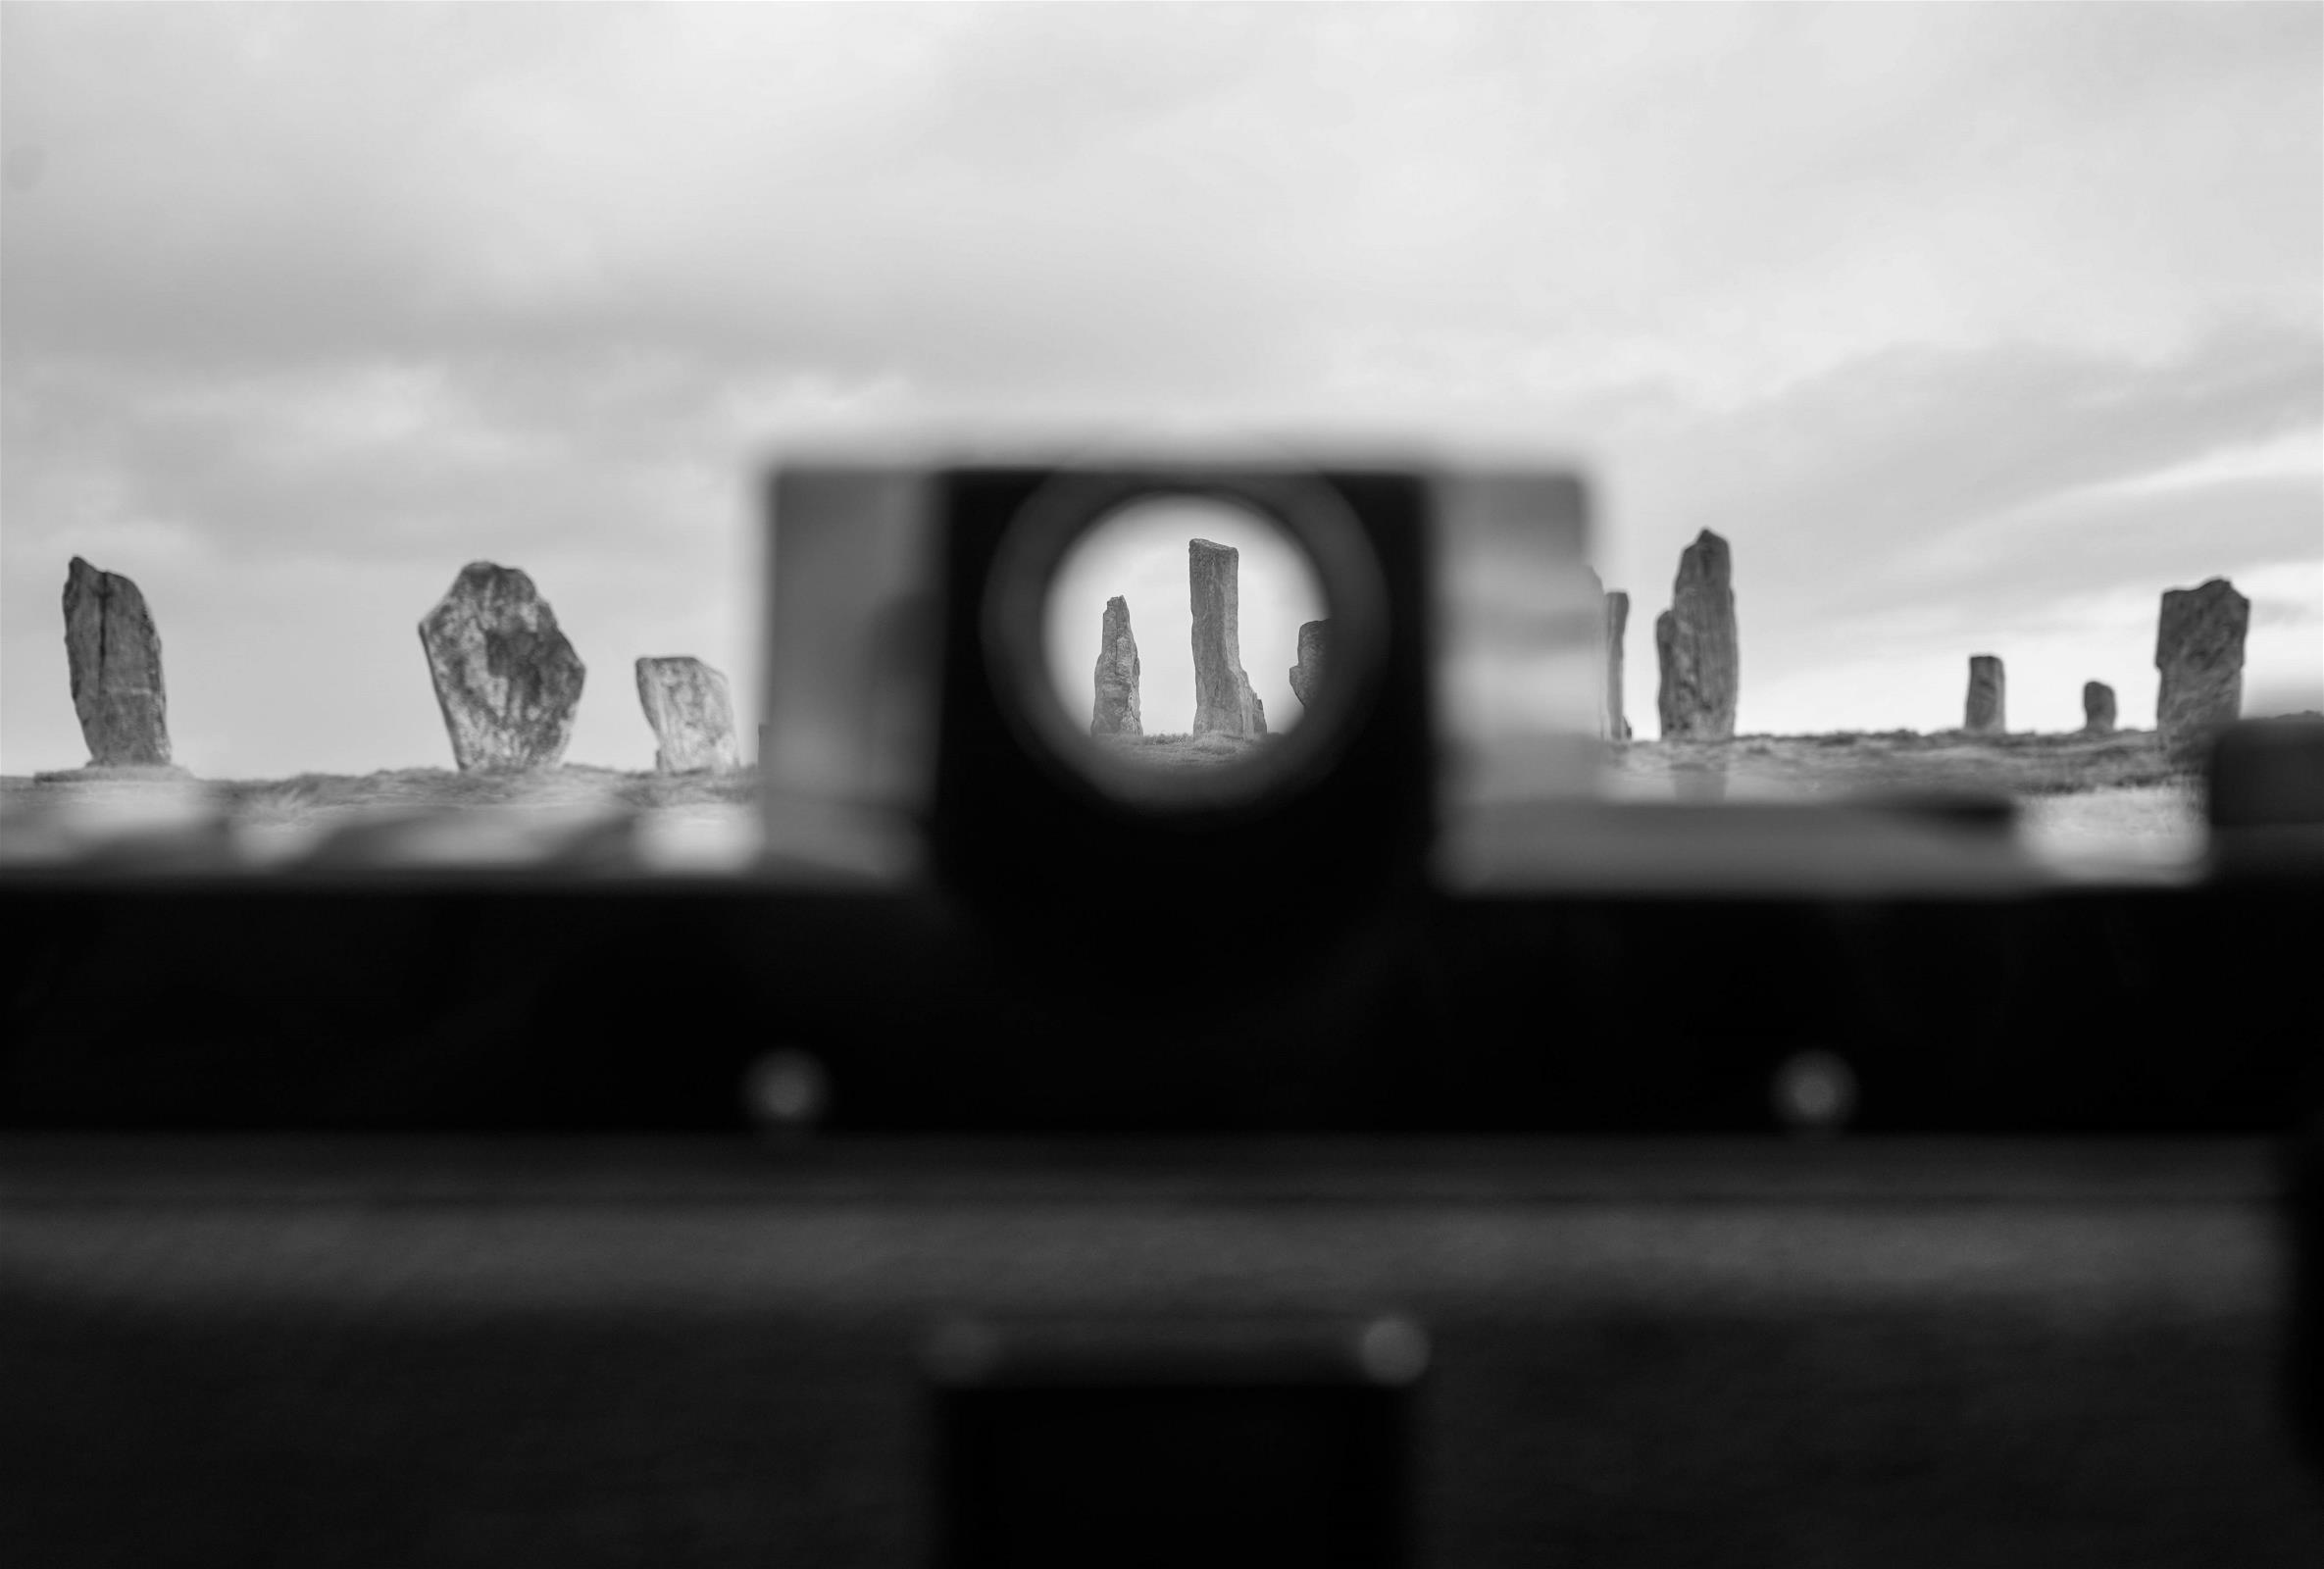 Callanish Stones Through The Viewfinder